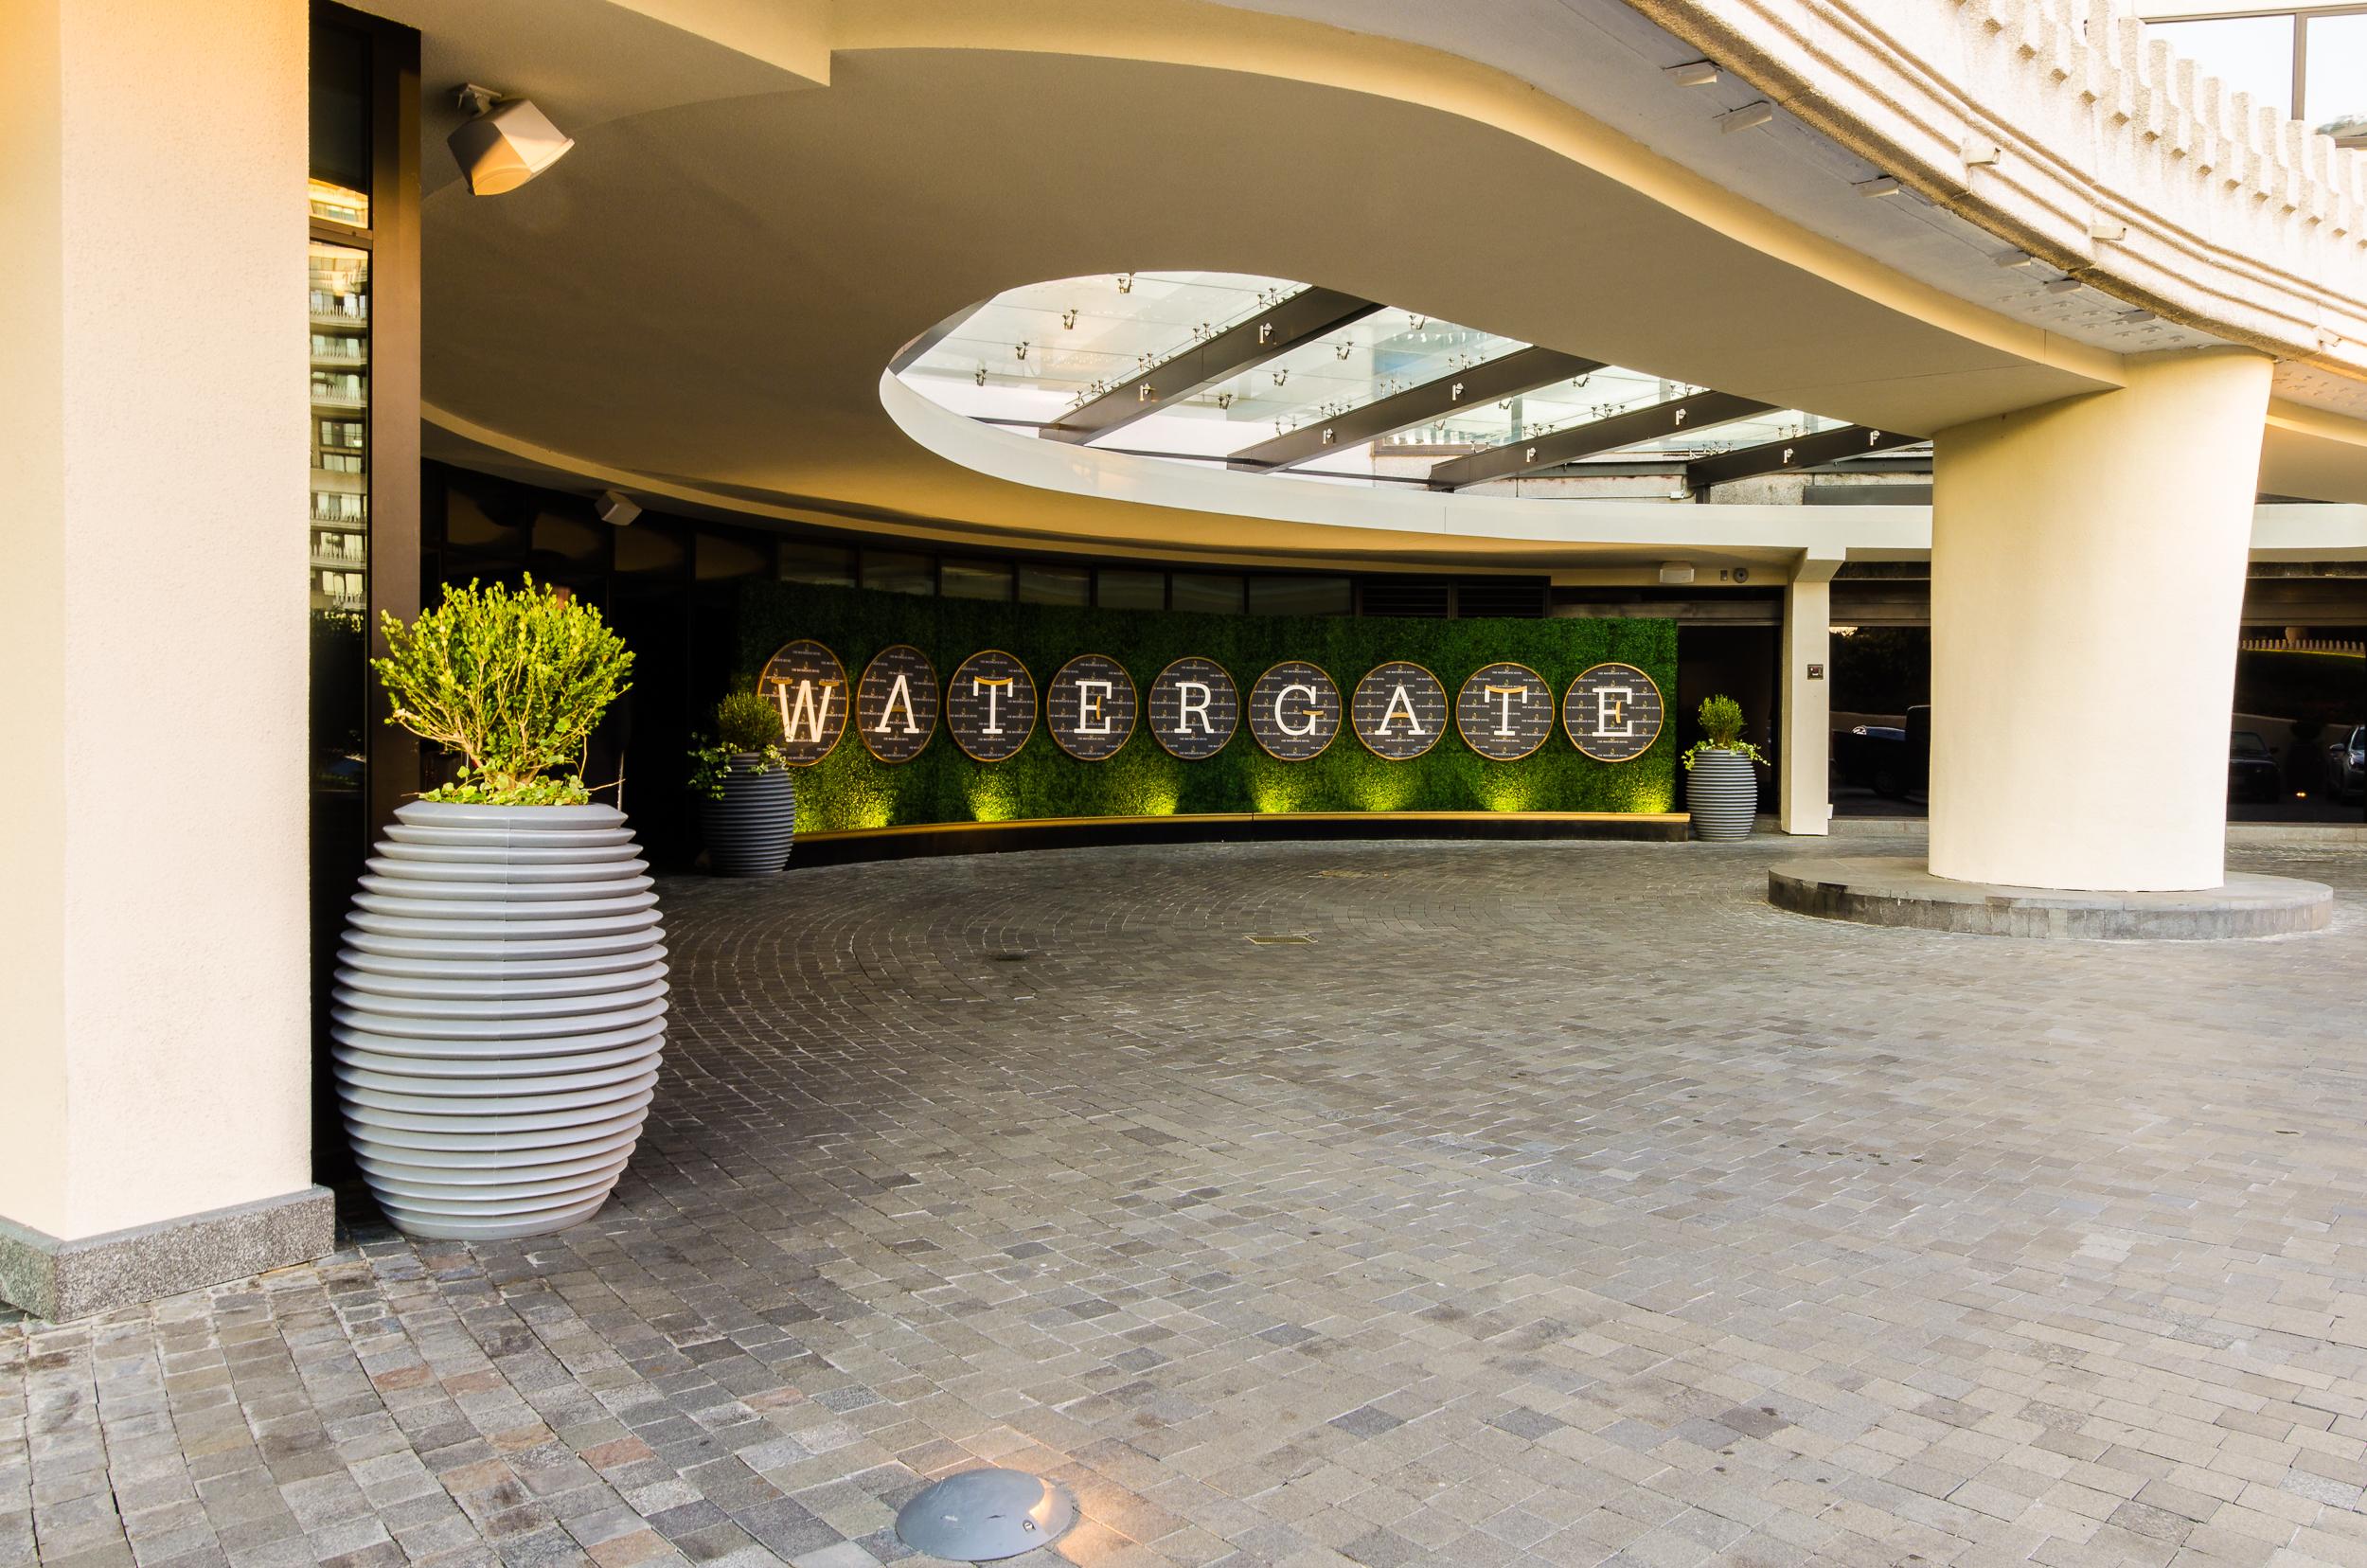 22_Watergate Hotel 01.jpg